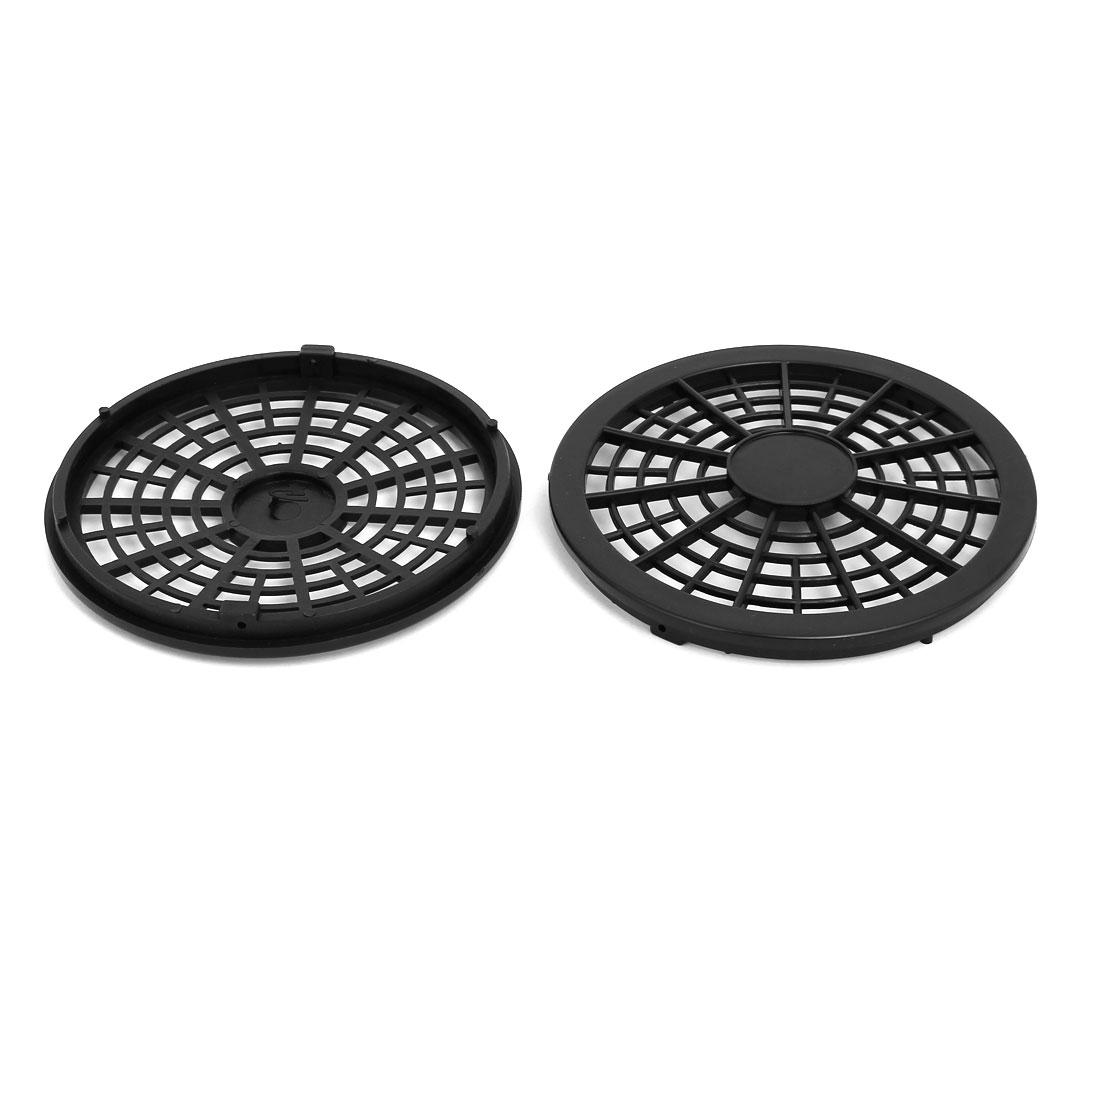 550W/750W 127mm Dia Plastic Air Compressor Replacement Fan Cover Black 2pcs